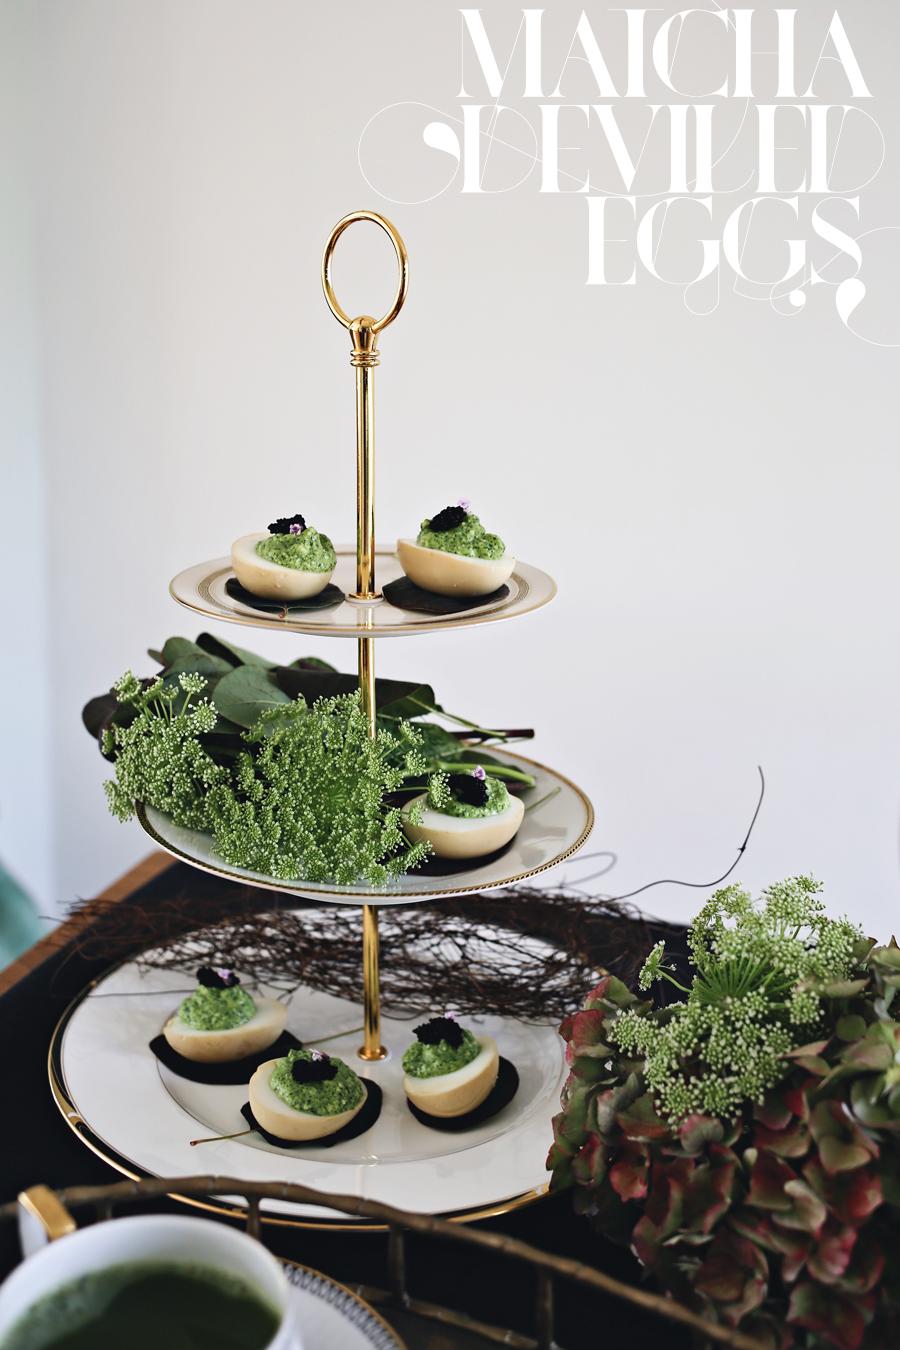 matcha-deviled-eggs-recipe-dine-x-design